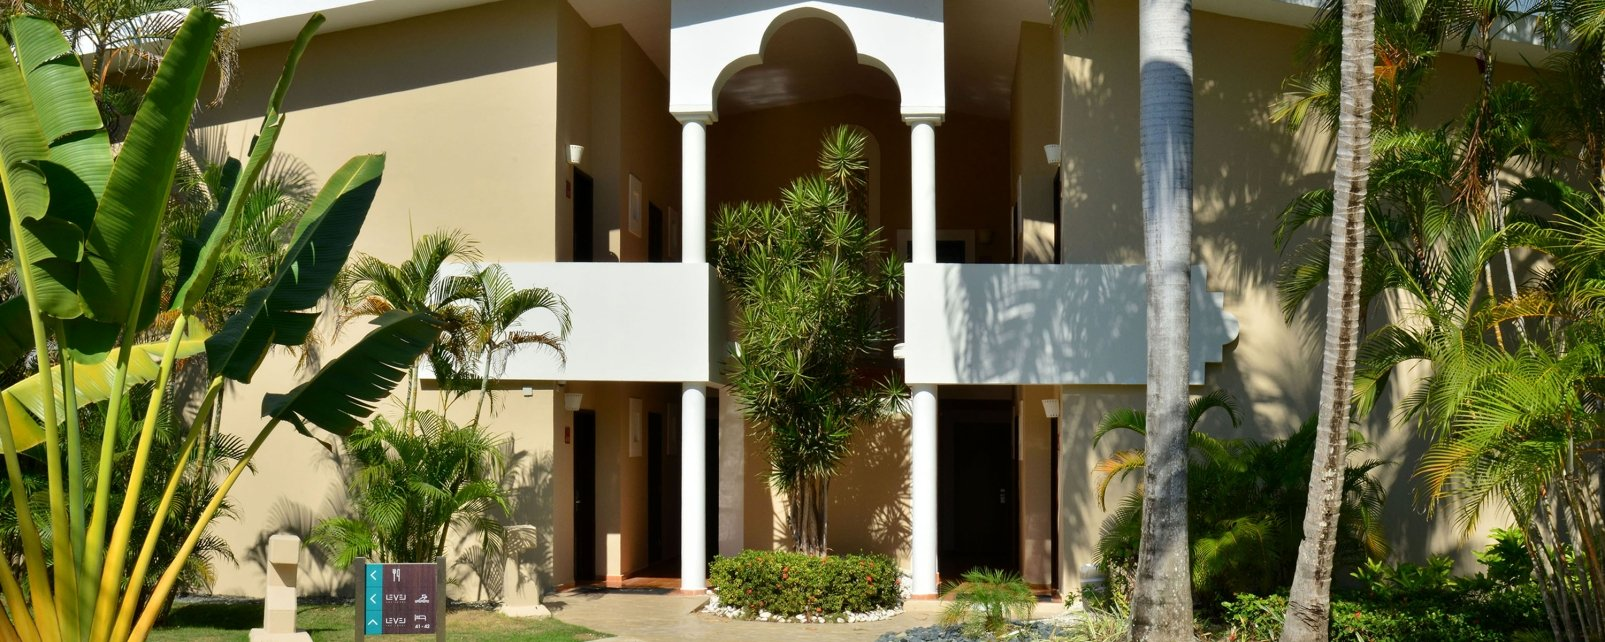 Hôtel Melia Caribe Beach